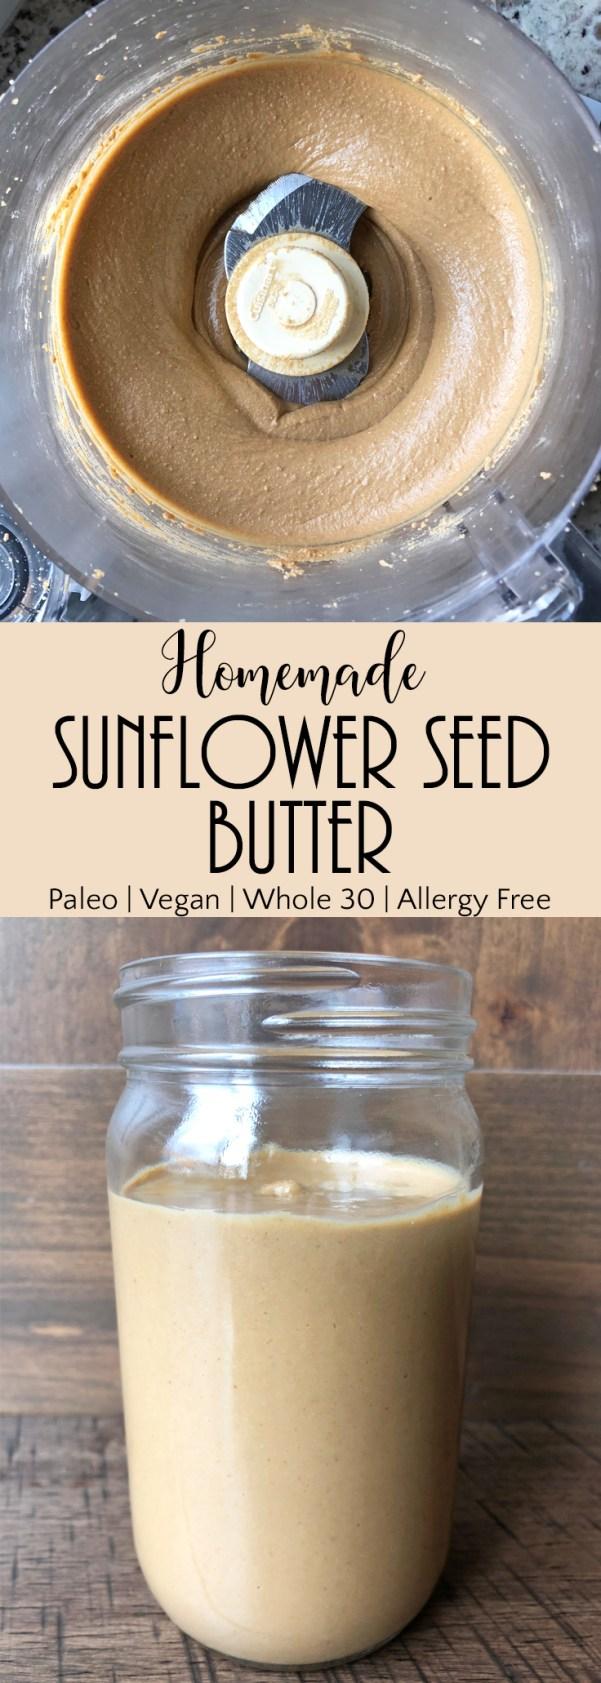 Homemade Unsweetened Sunflower Seed Butter.jpg